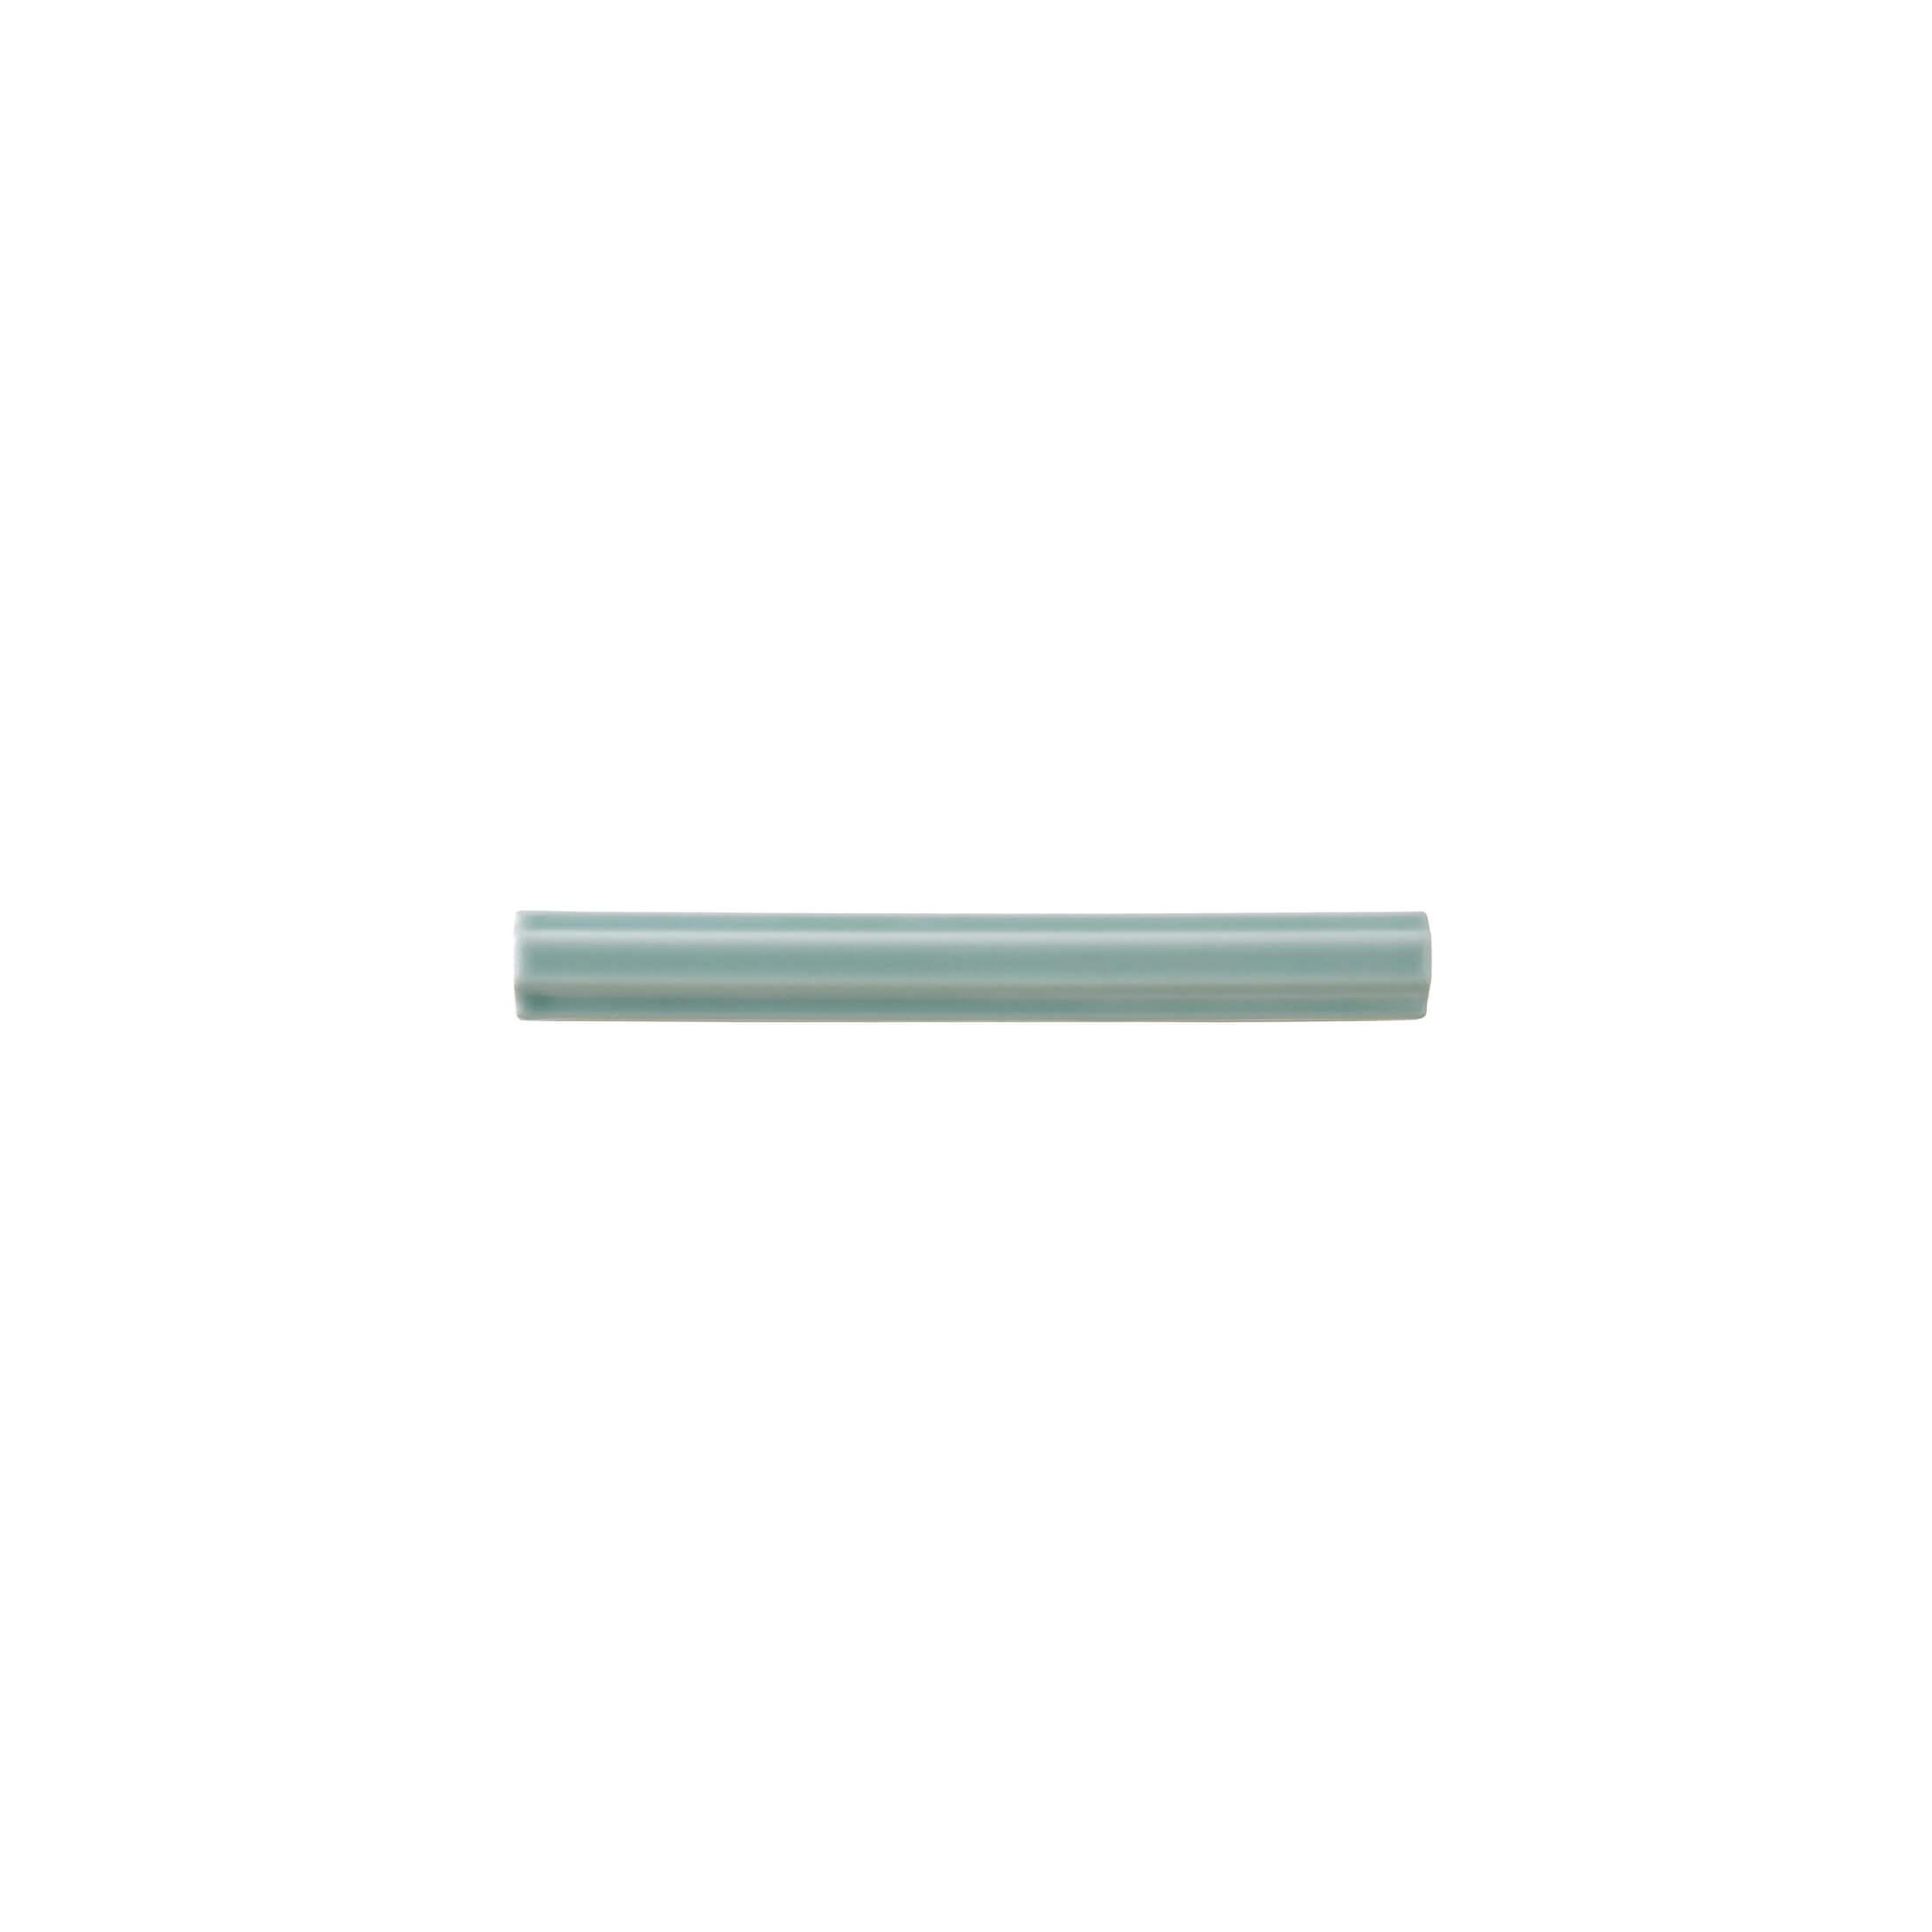 ADNE5620 - LISTELO CLASICO - 1.7 cm X 15 cm